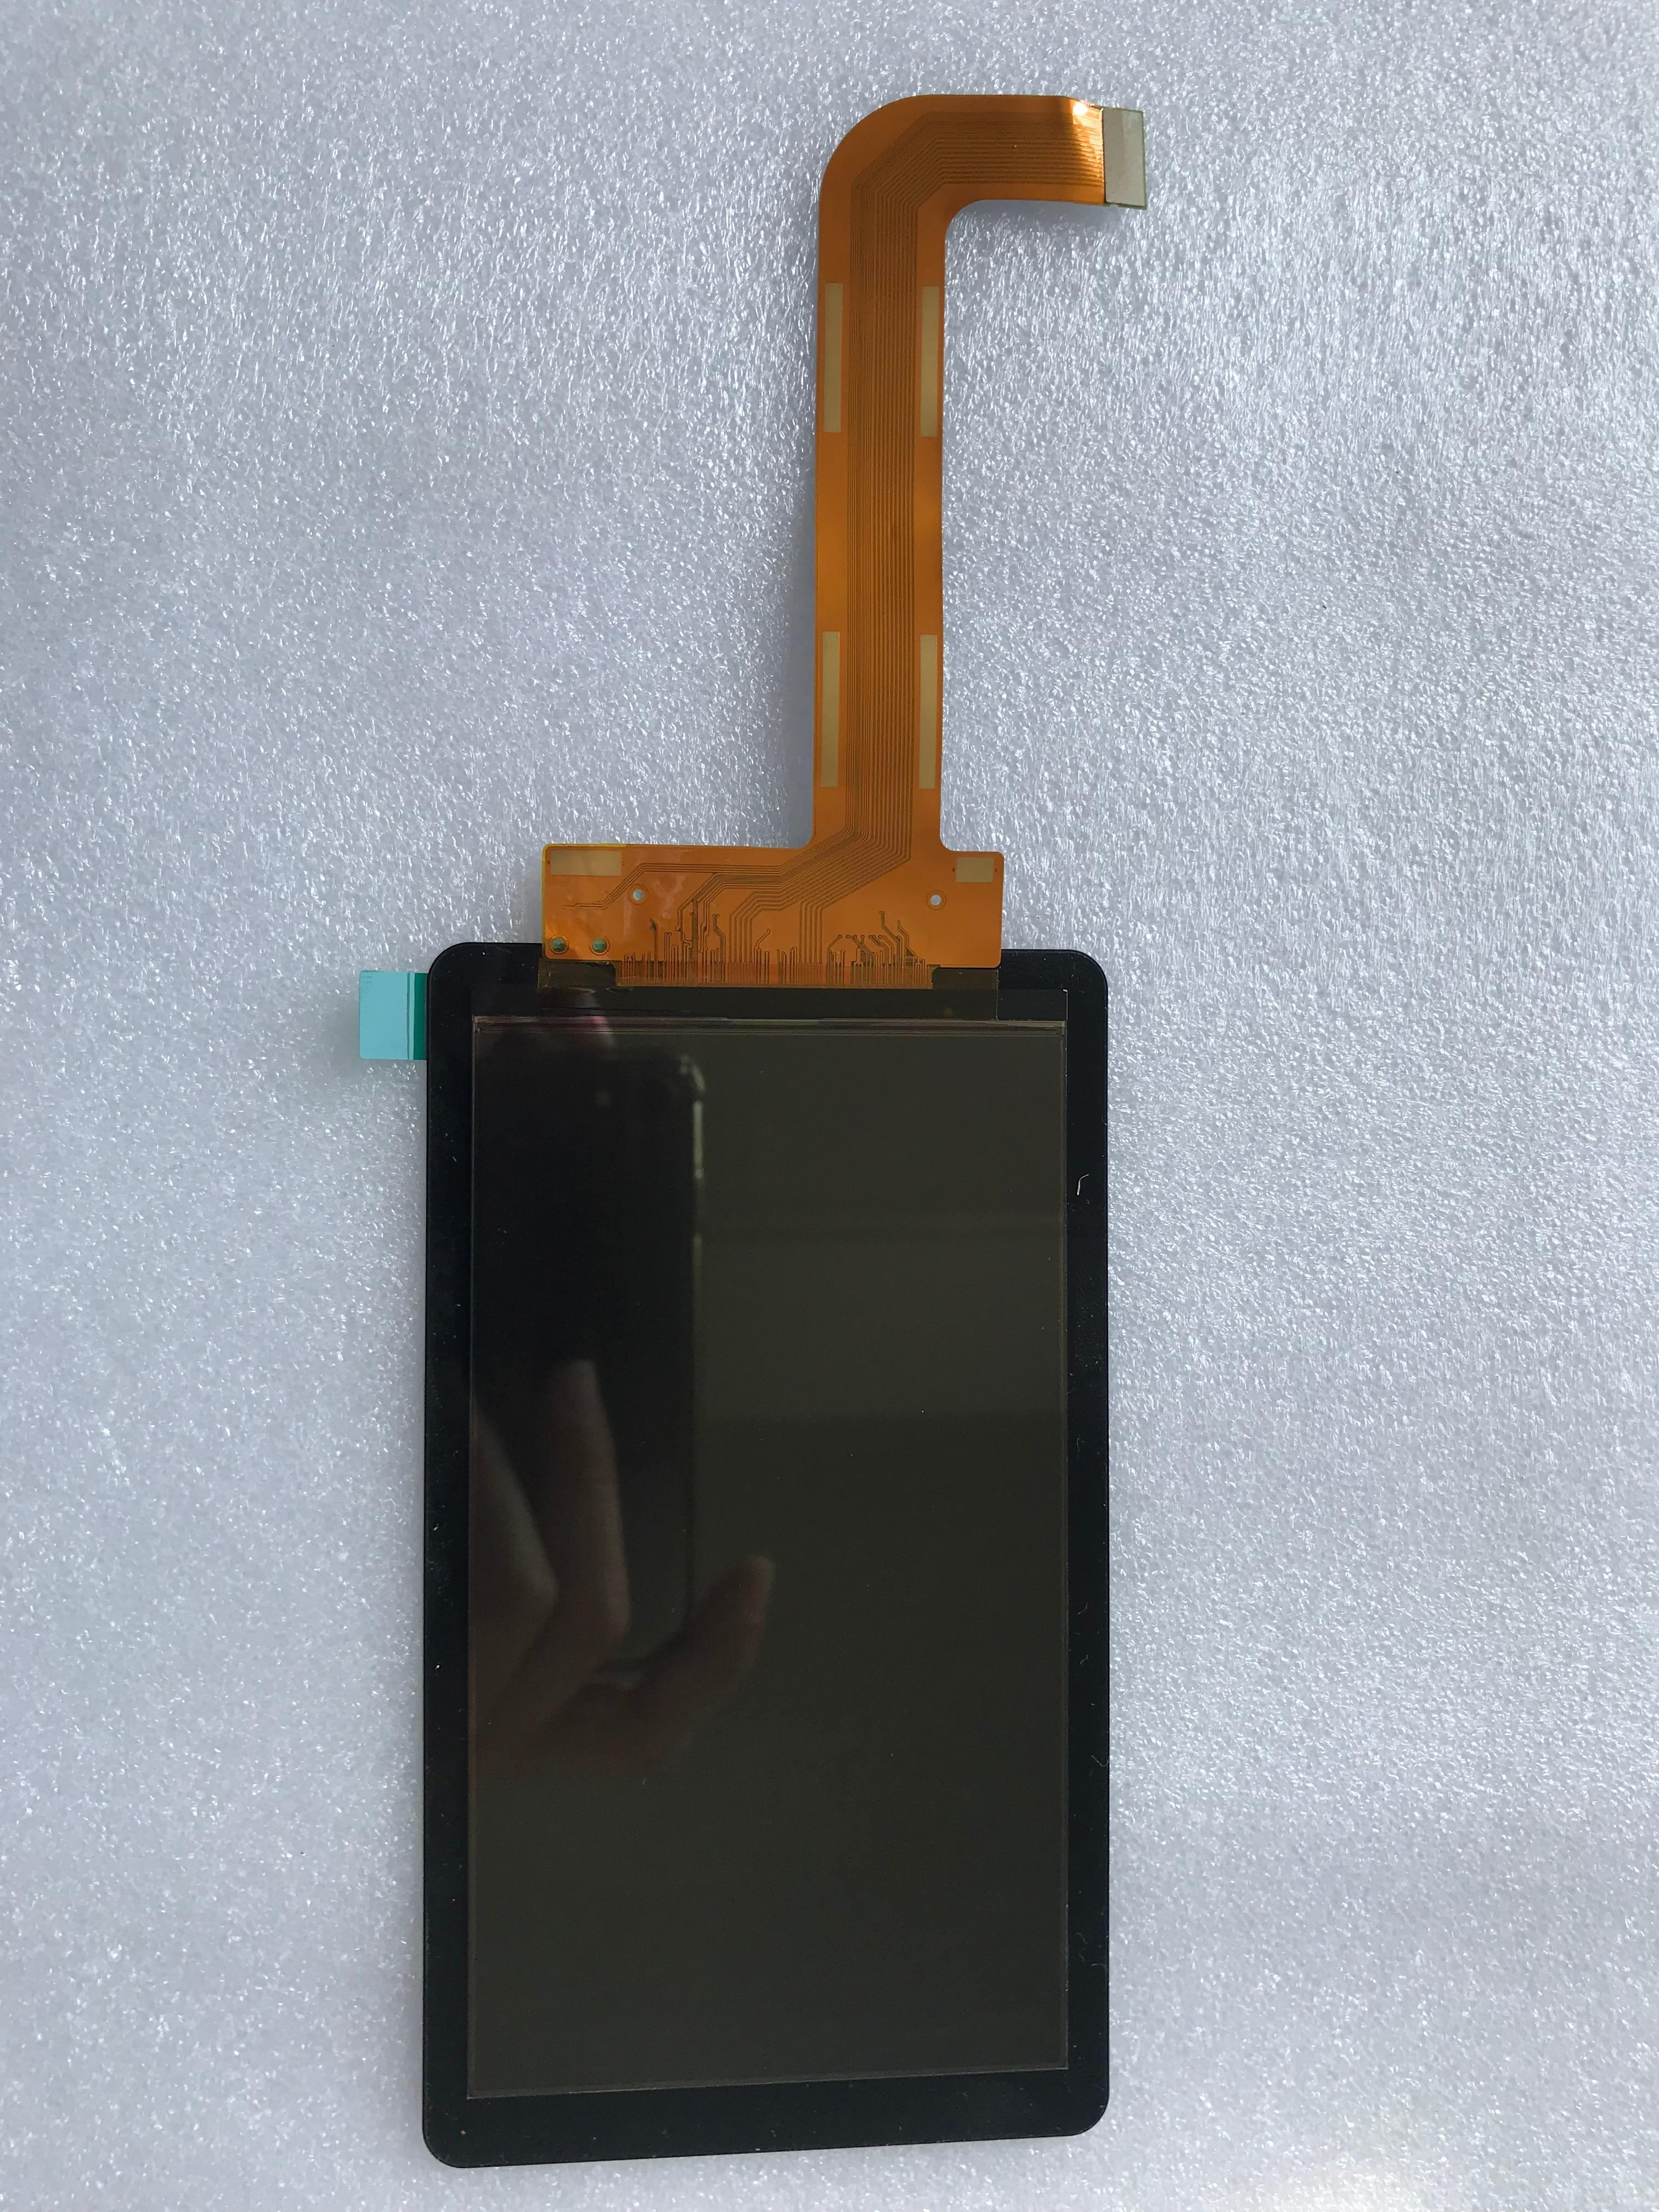 QIDI TECH SHADOW 5.5S LCD 2K SCREEN